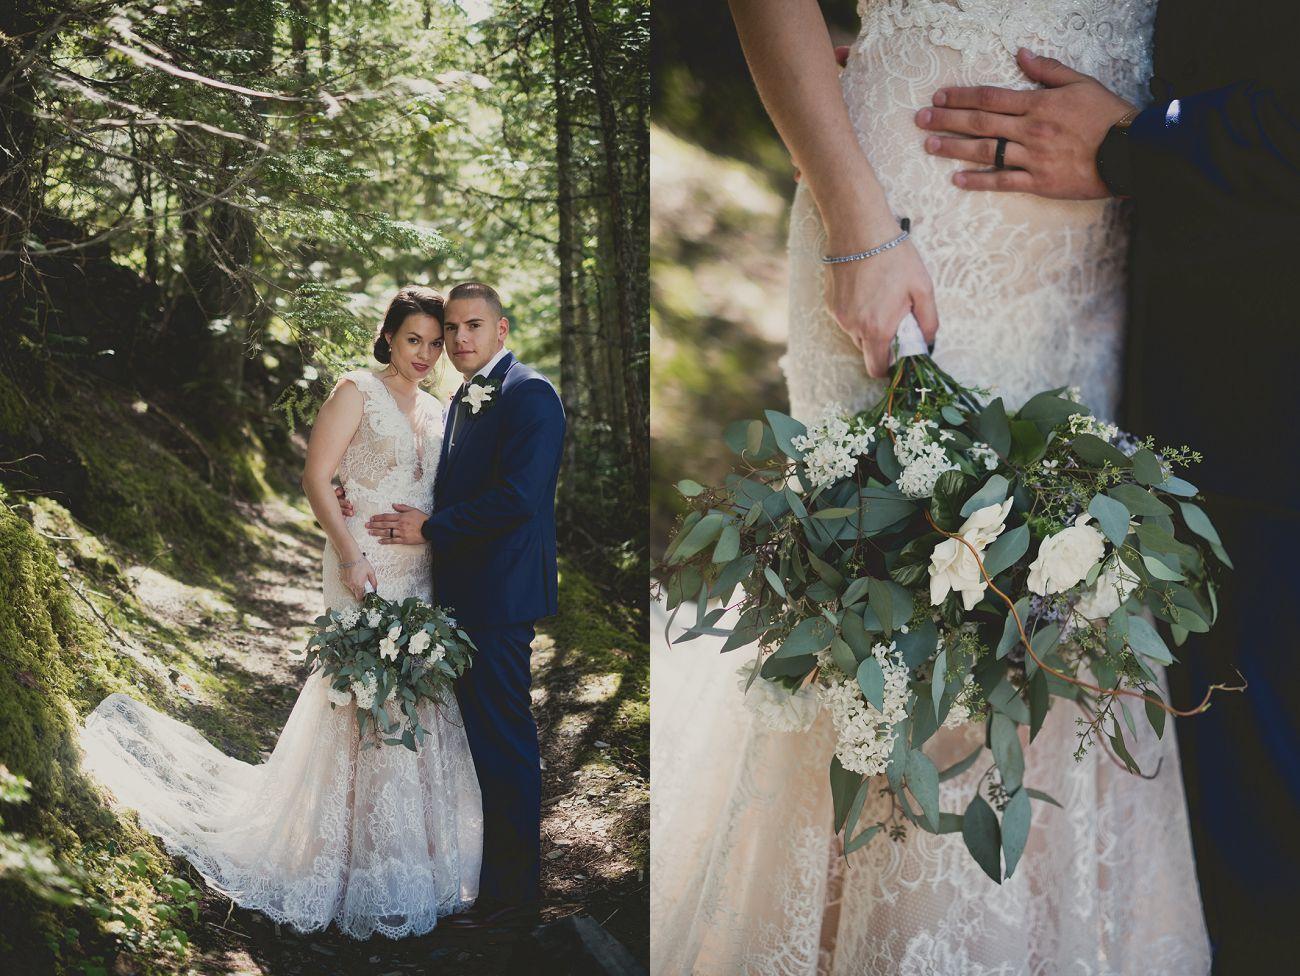 Jennifer_Mooney_Photo_Glacier_Park_Weddings_Elopement_00048.jpg